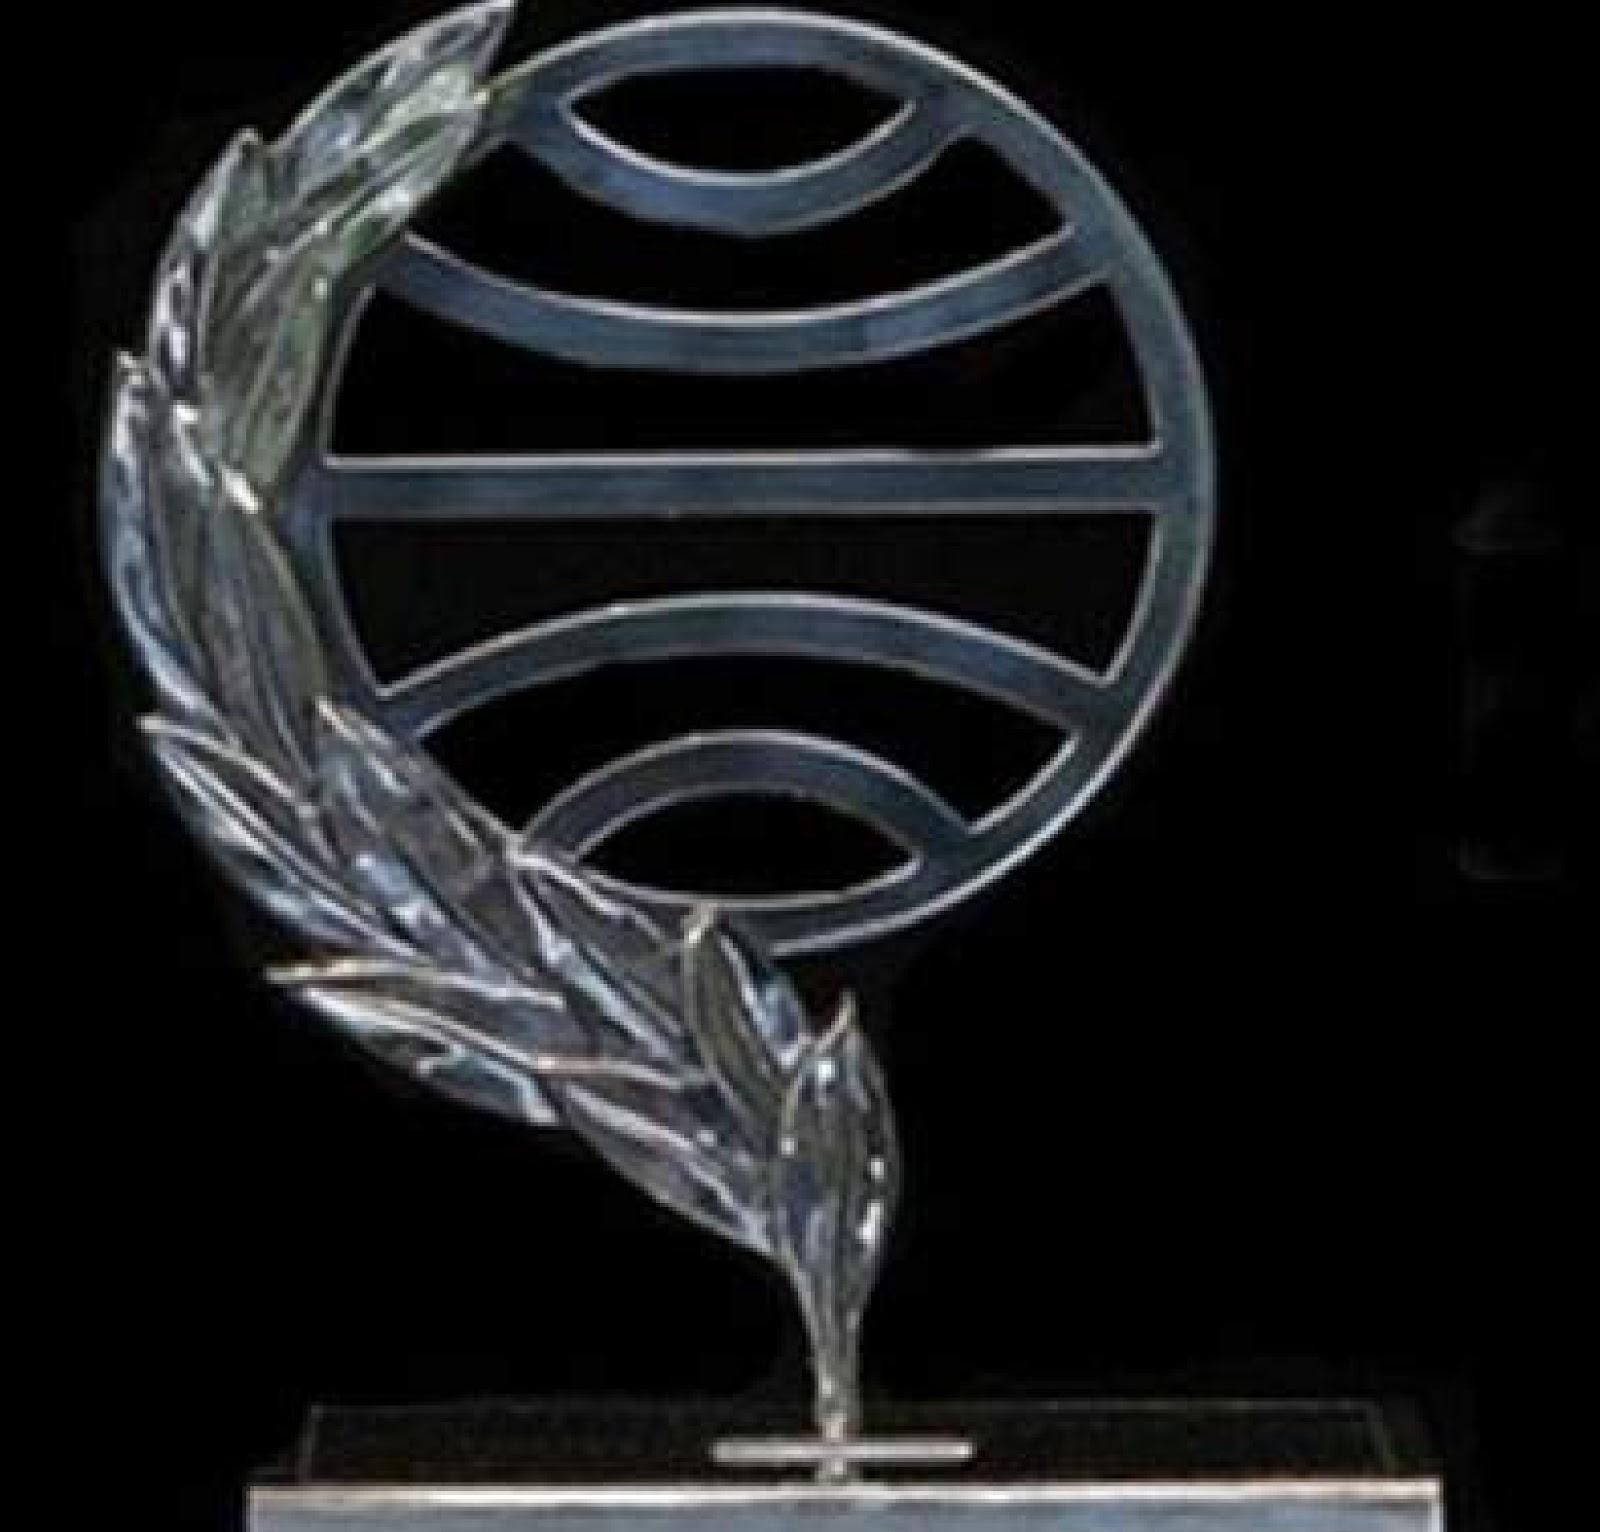 finalistas premios planeta: